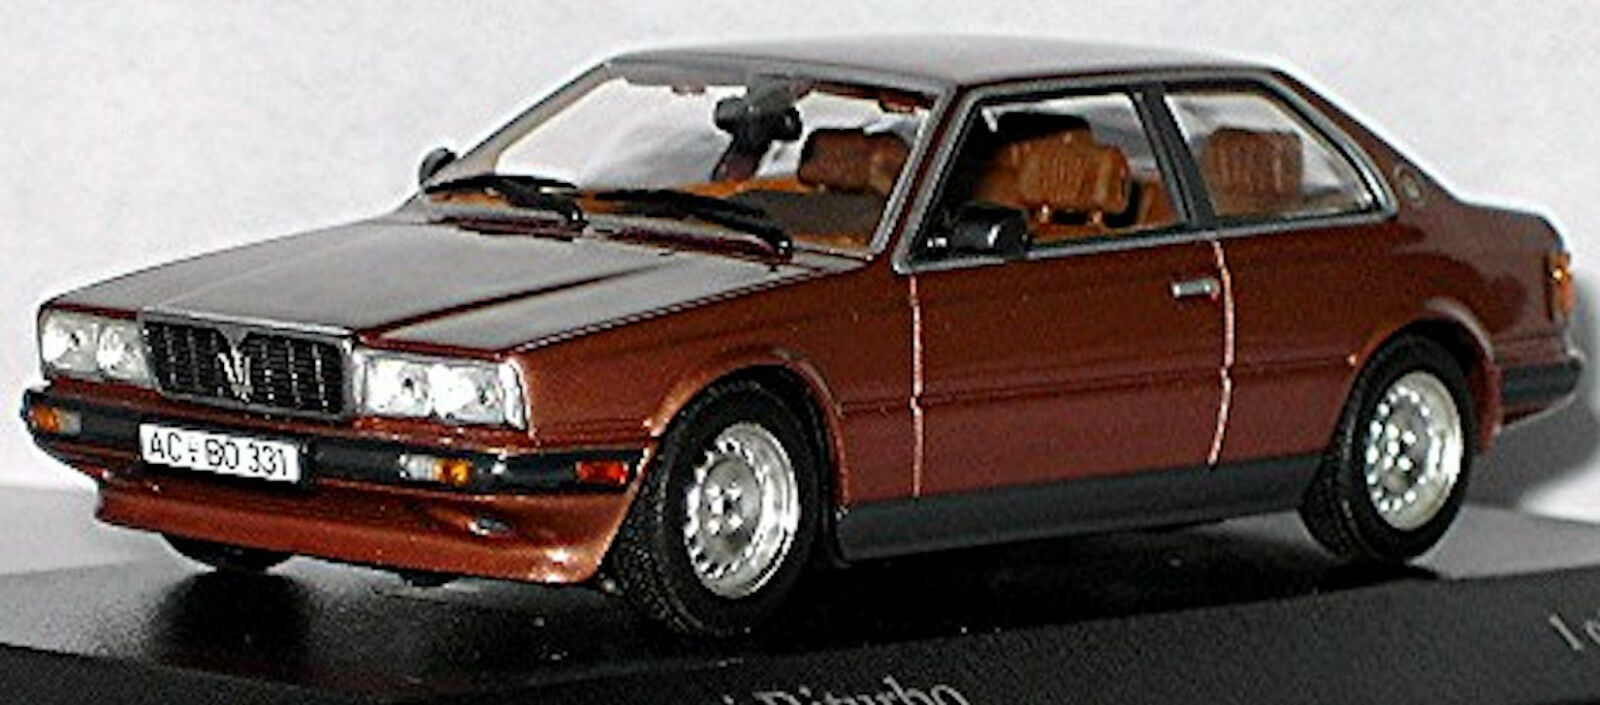 Maserati Biturbo 1981-82 brown 80 Metálico Cobre Cobre 1 43 Minichamps